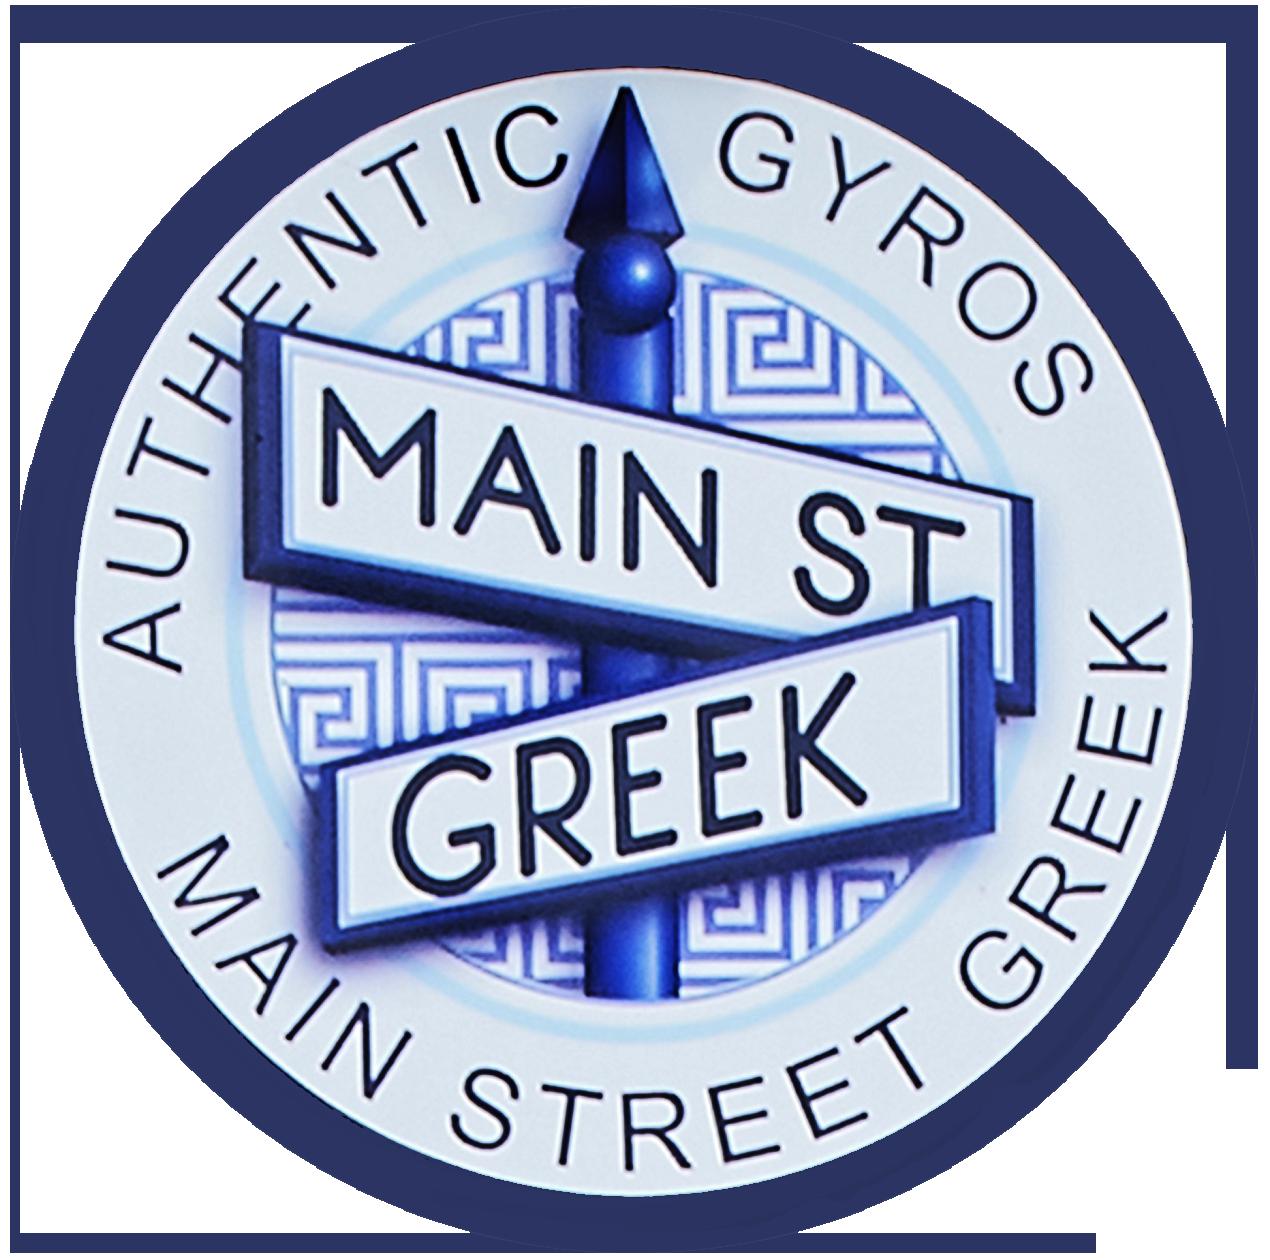 Main Street Greek